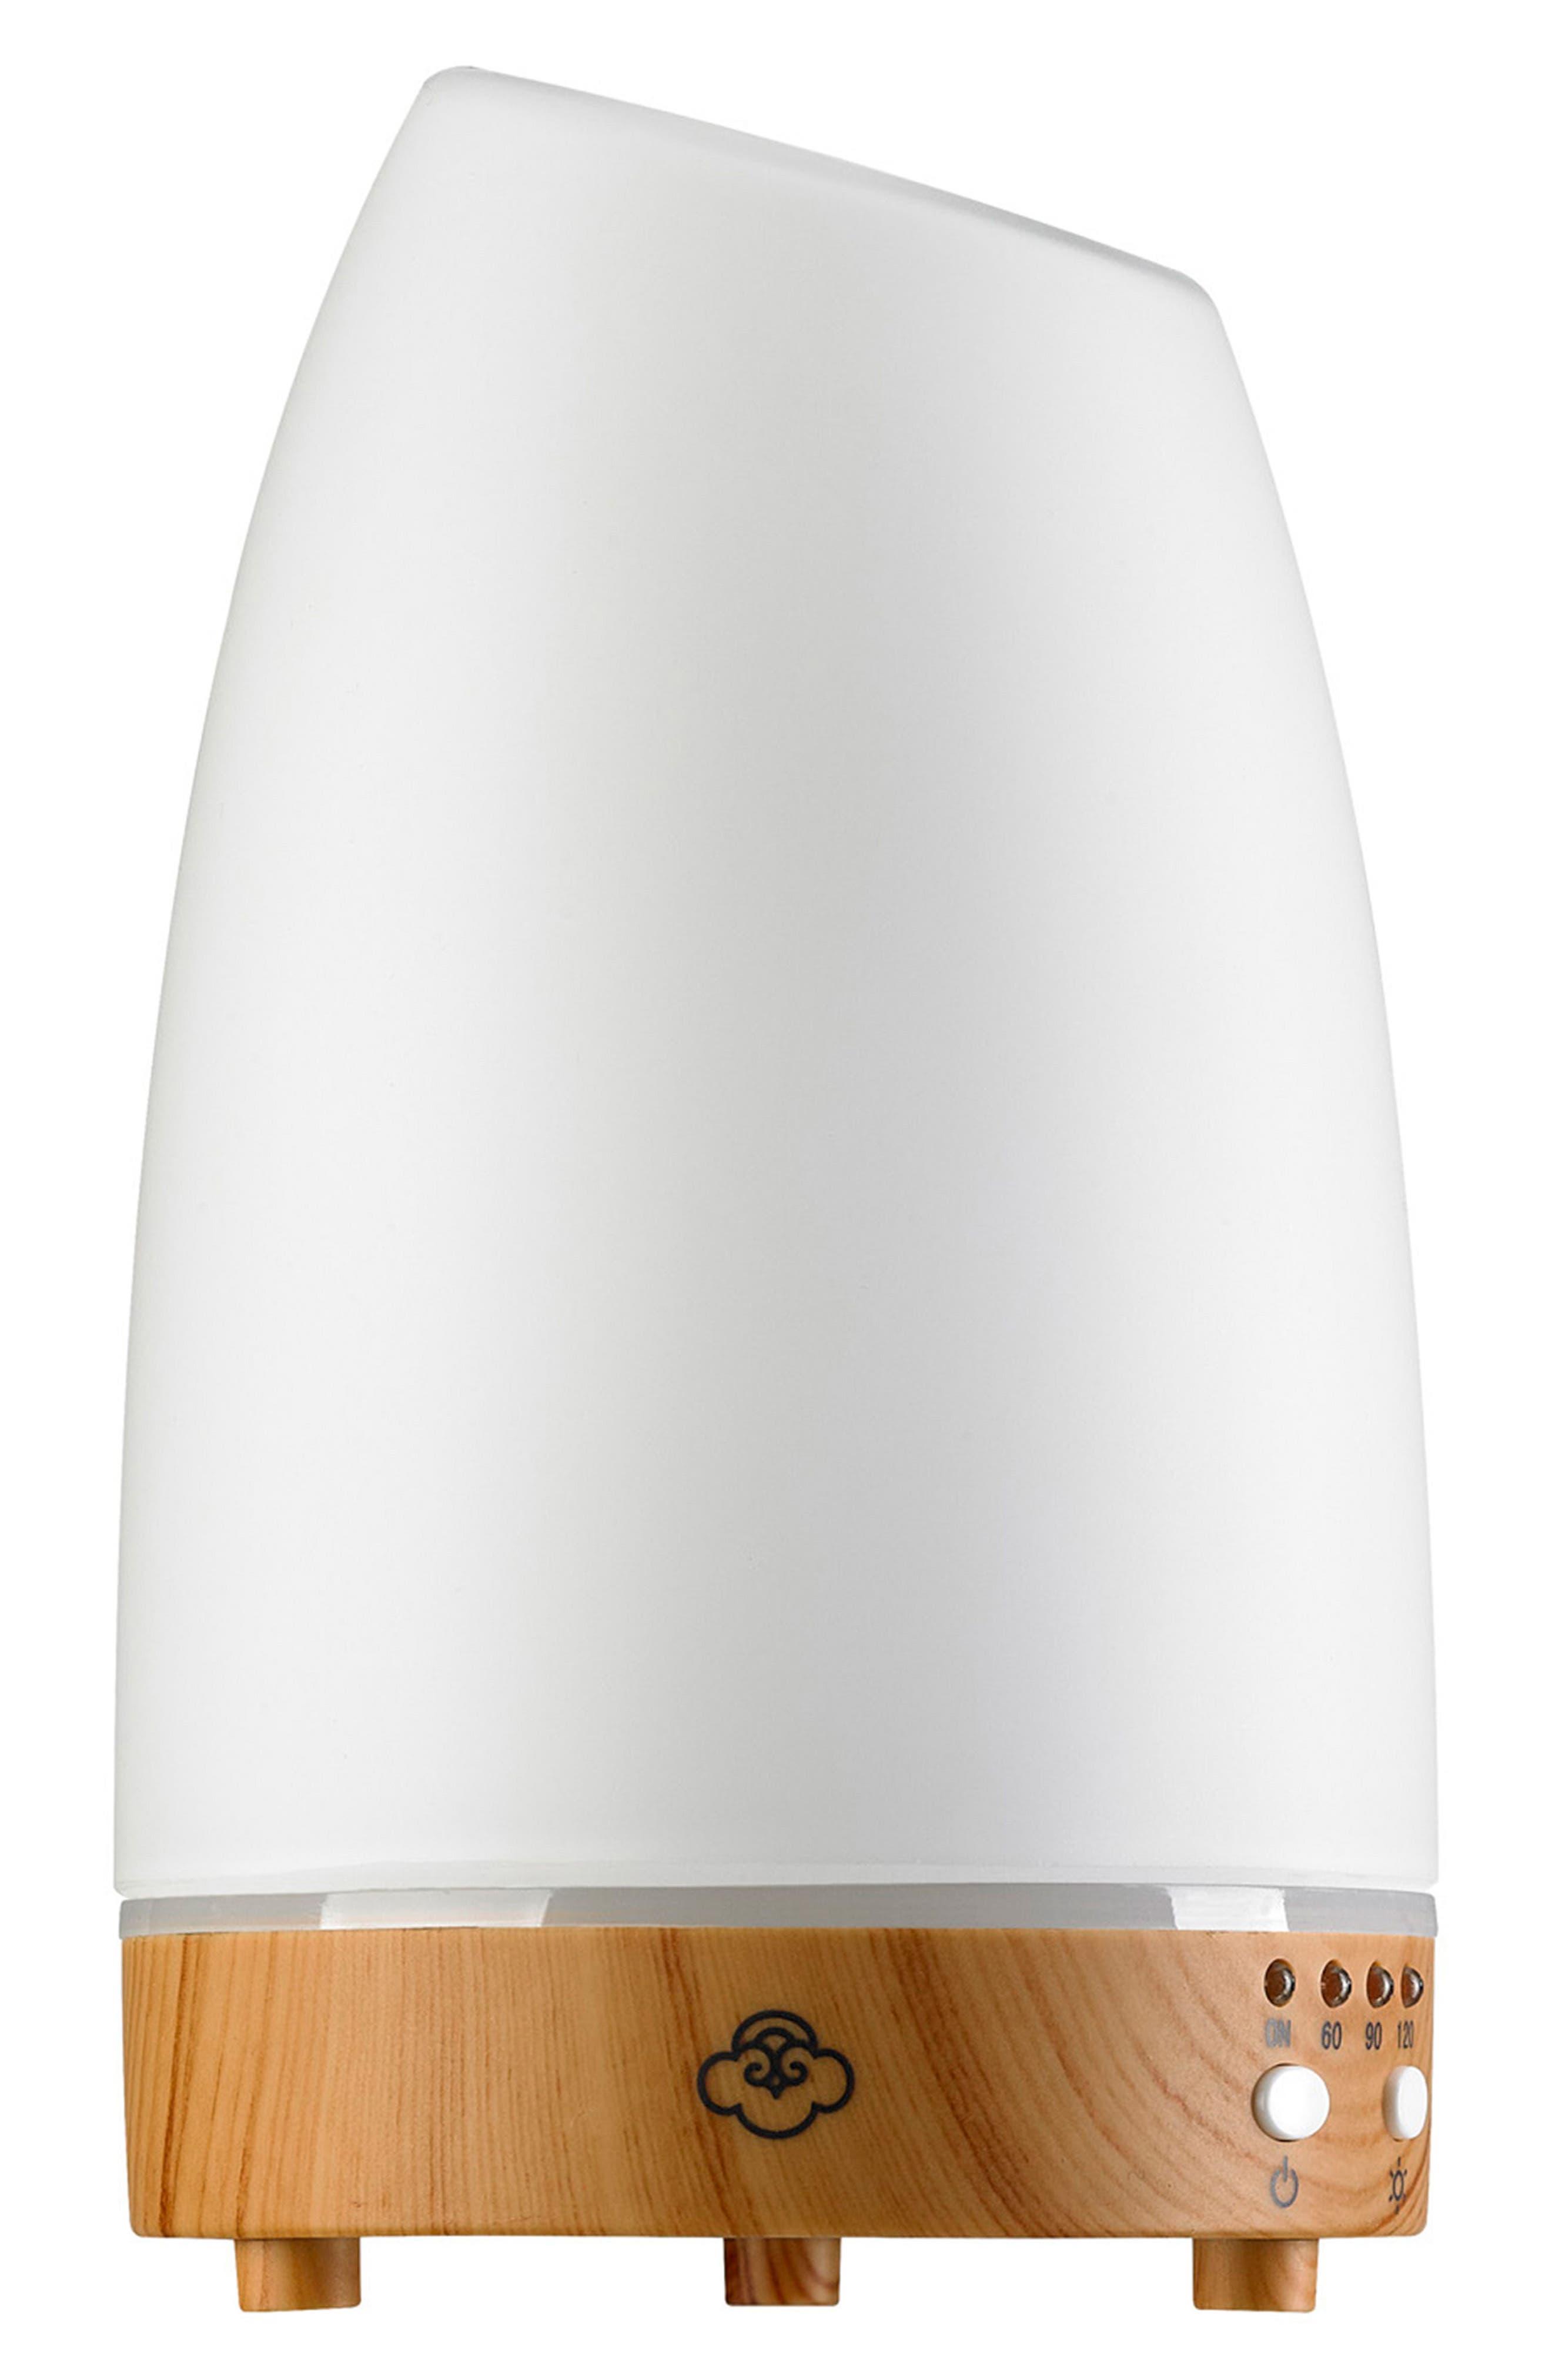 Main Image - Serene House Ultrasonic Cool Mist Aromatherapy Diffuser